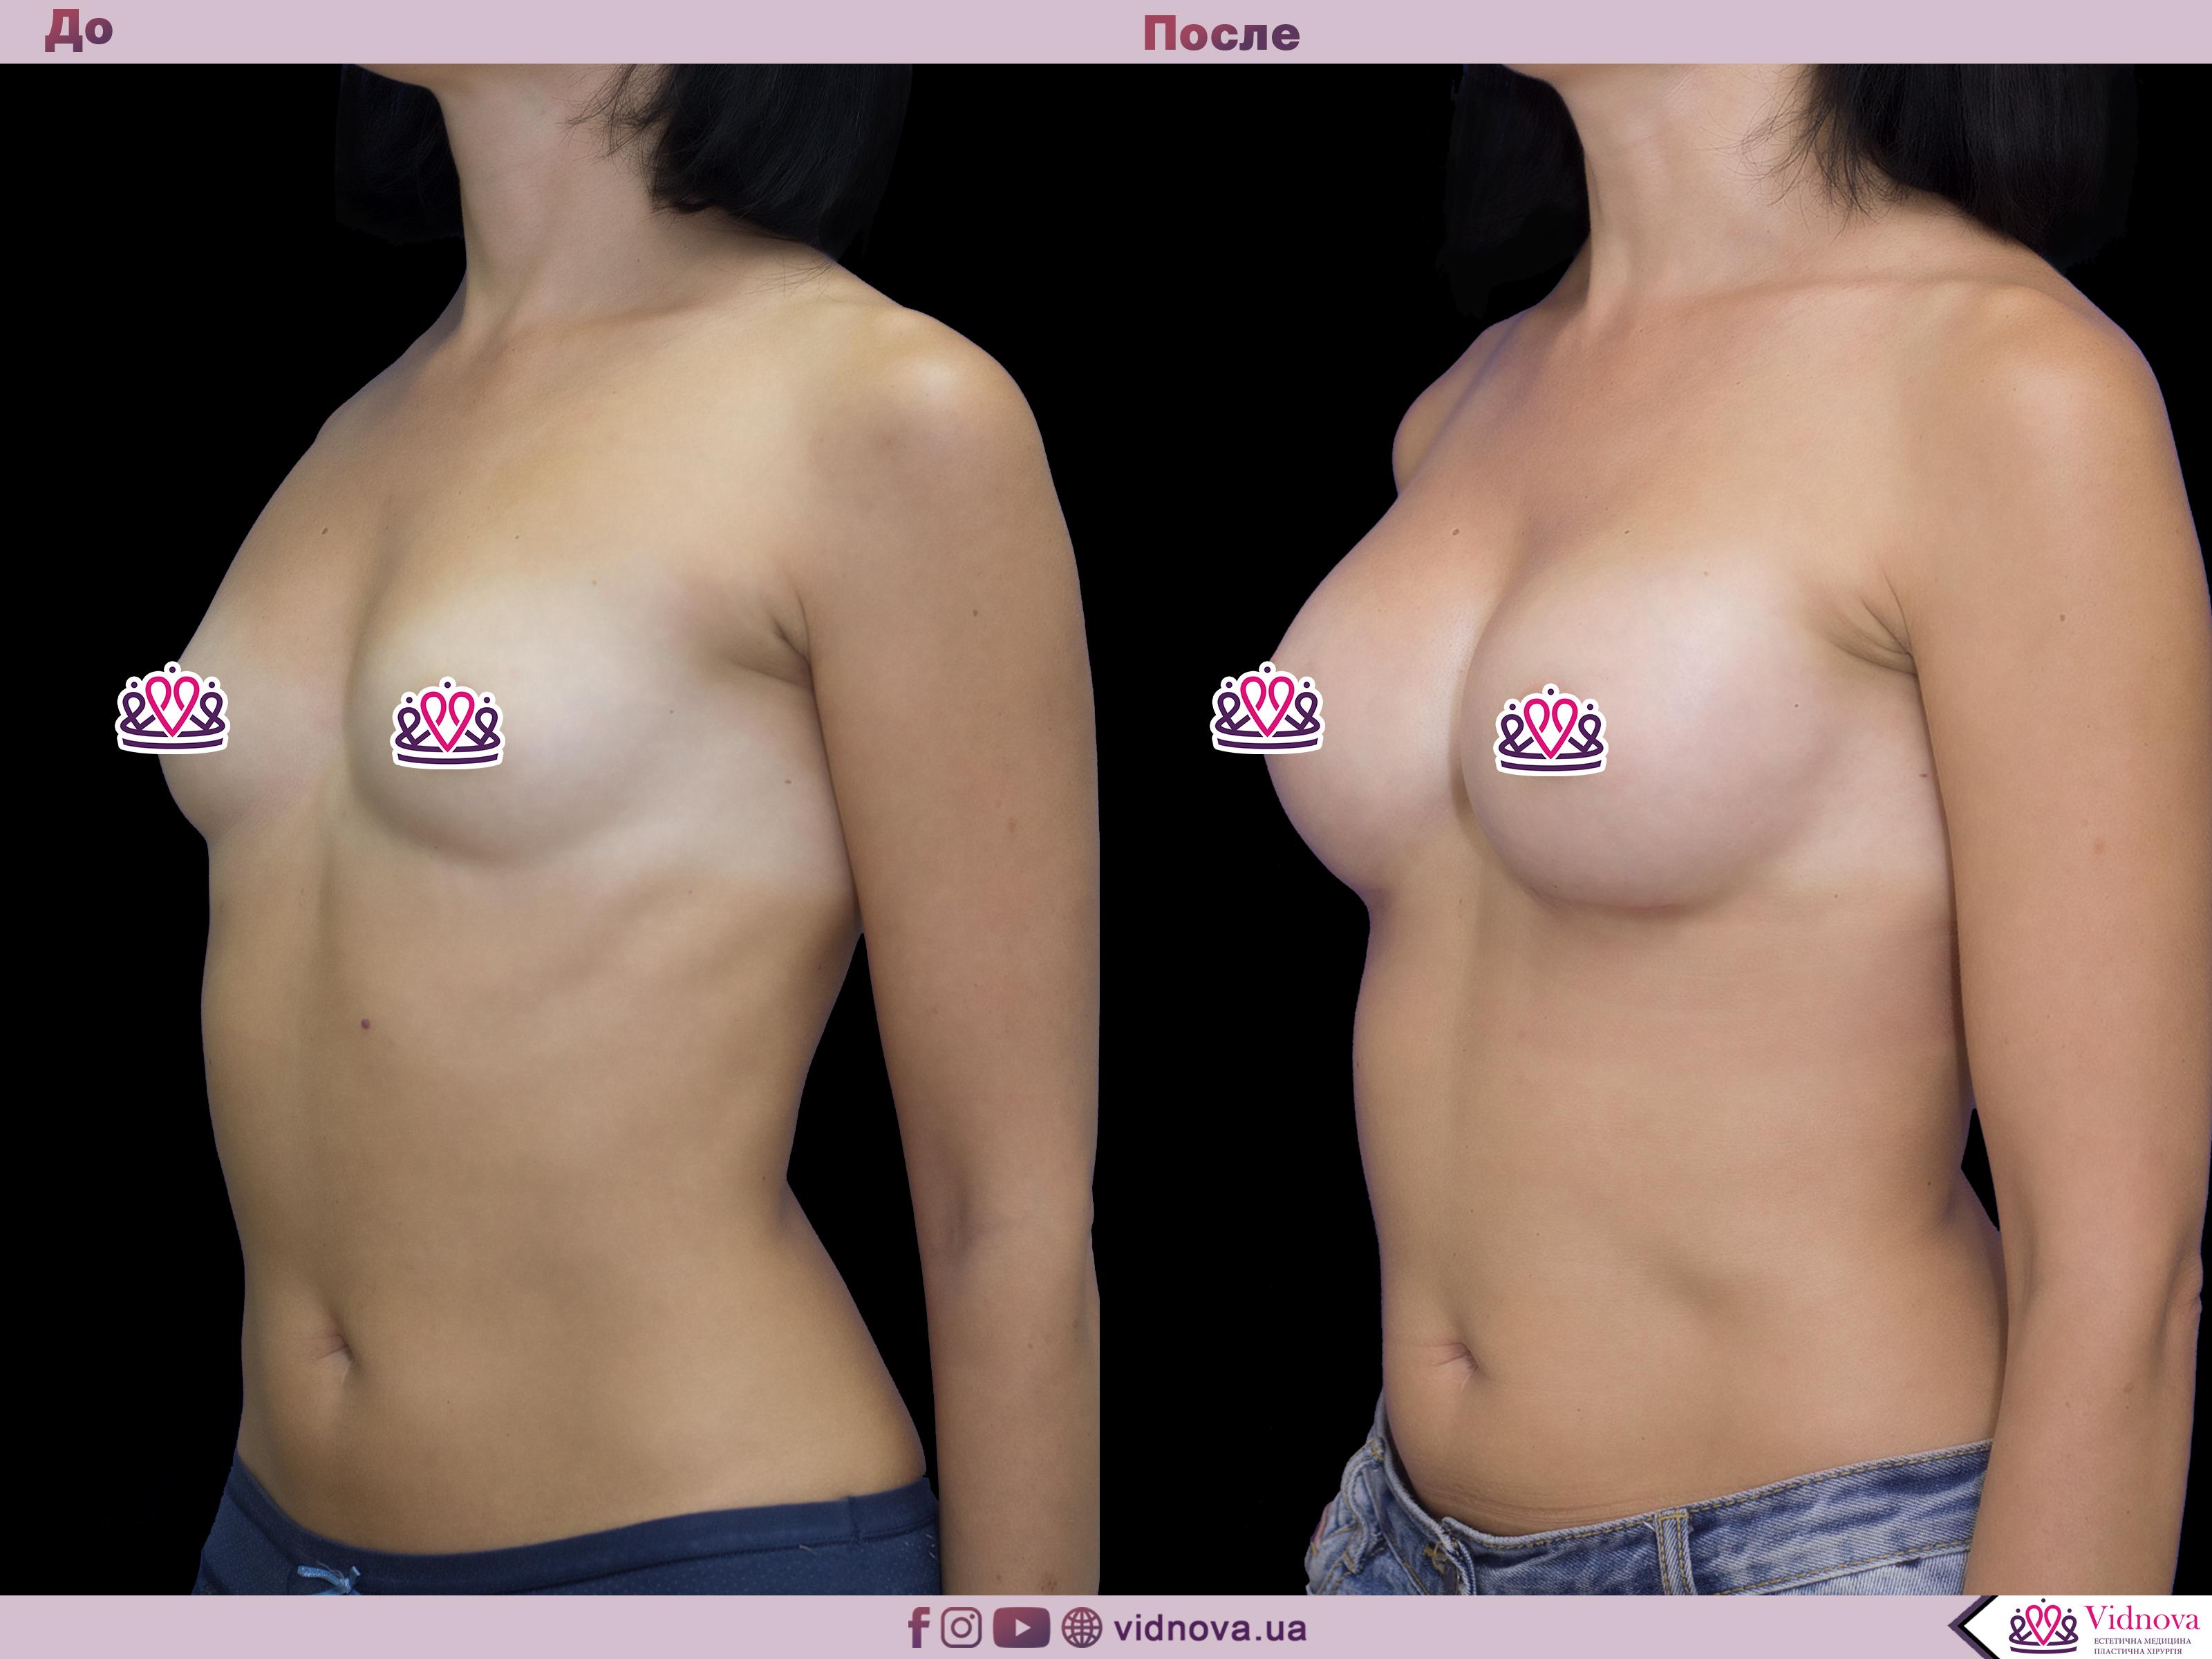 Увеличение груди: Фото ДО и ПОСЛЕ - Пример №42-2 - Клиника Vidnova